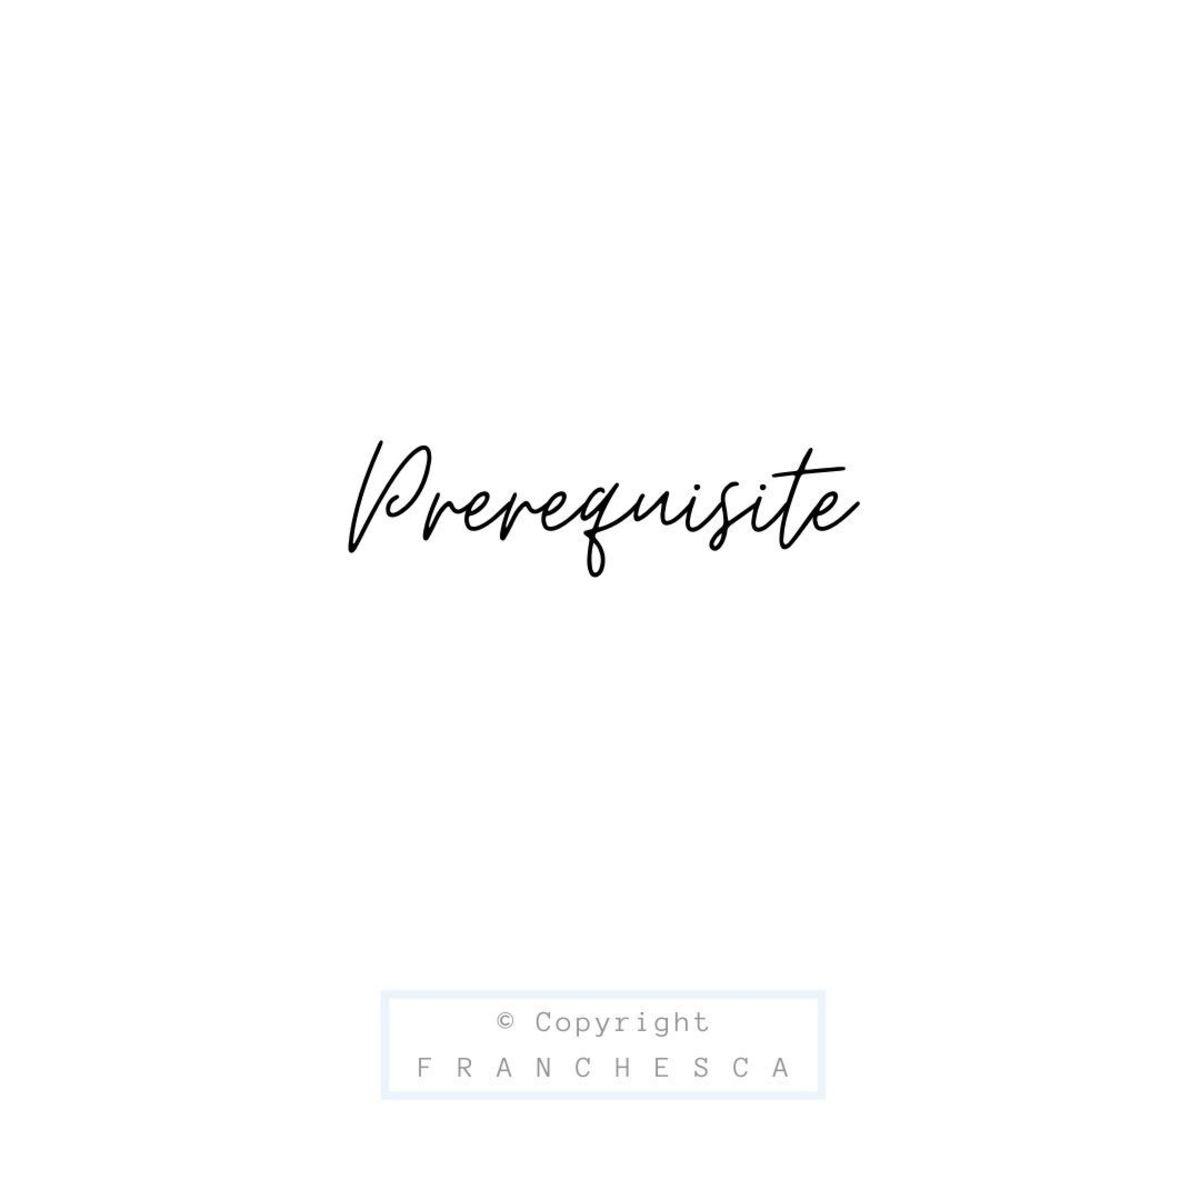 180th Article: Prerequisite